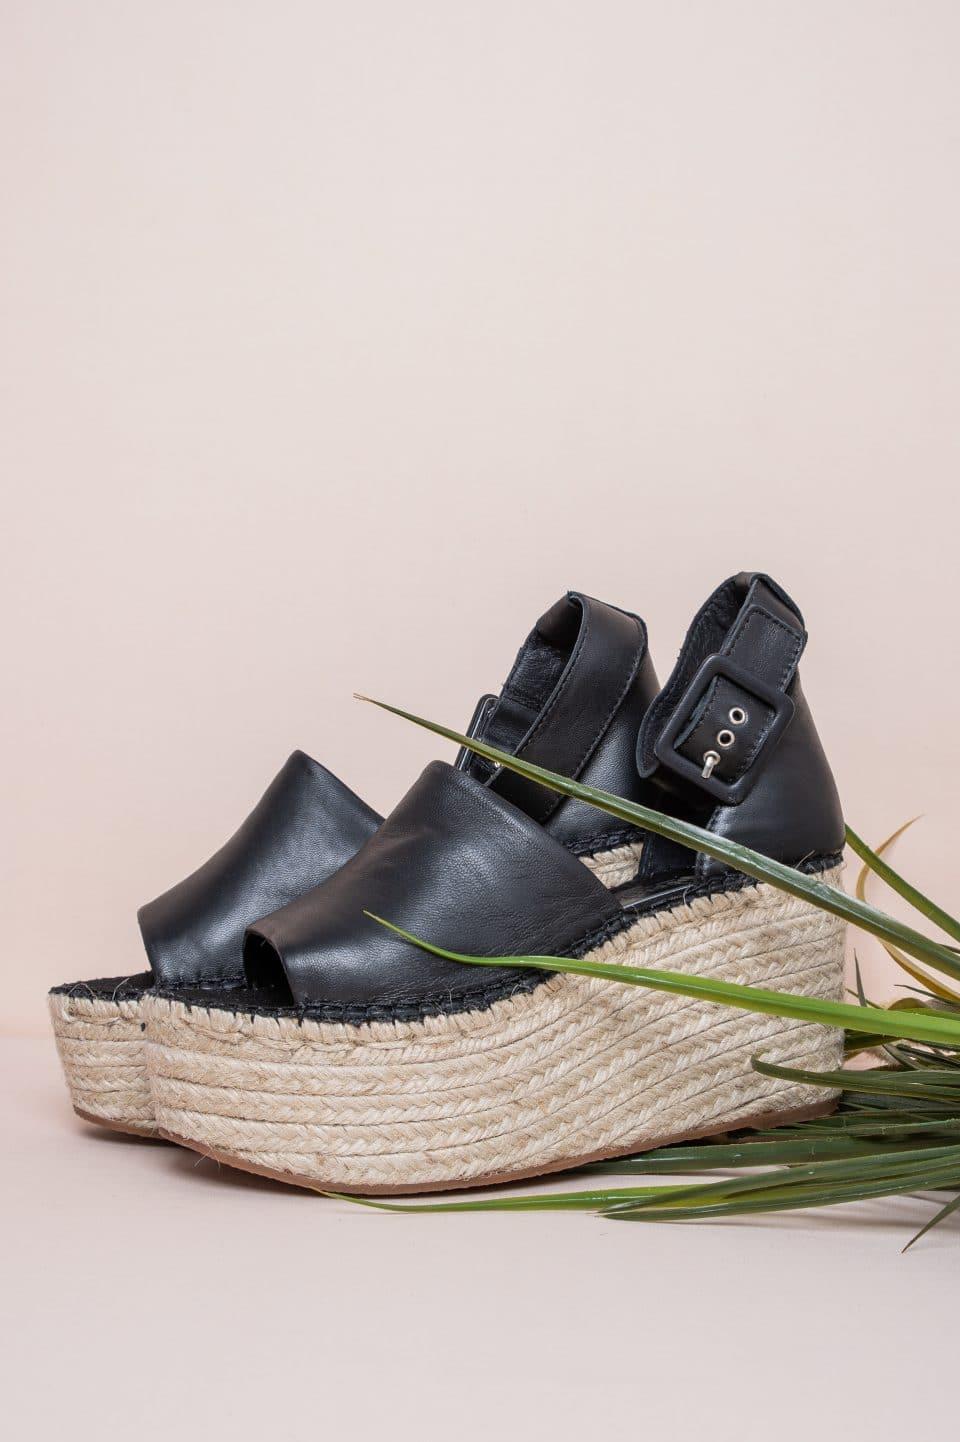 Sandalia Cuña Esparto Piel Napa Negro Alpargatas en Loyna Shoes